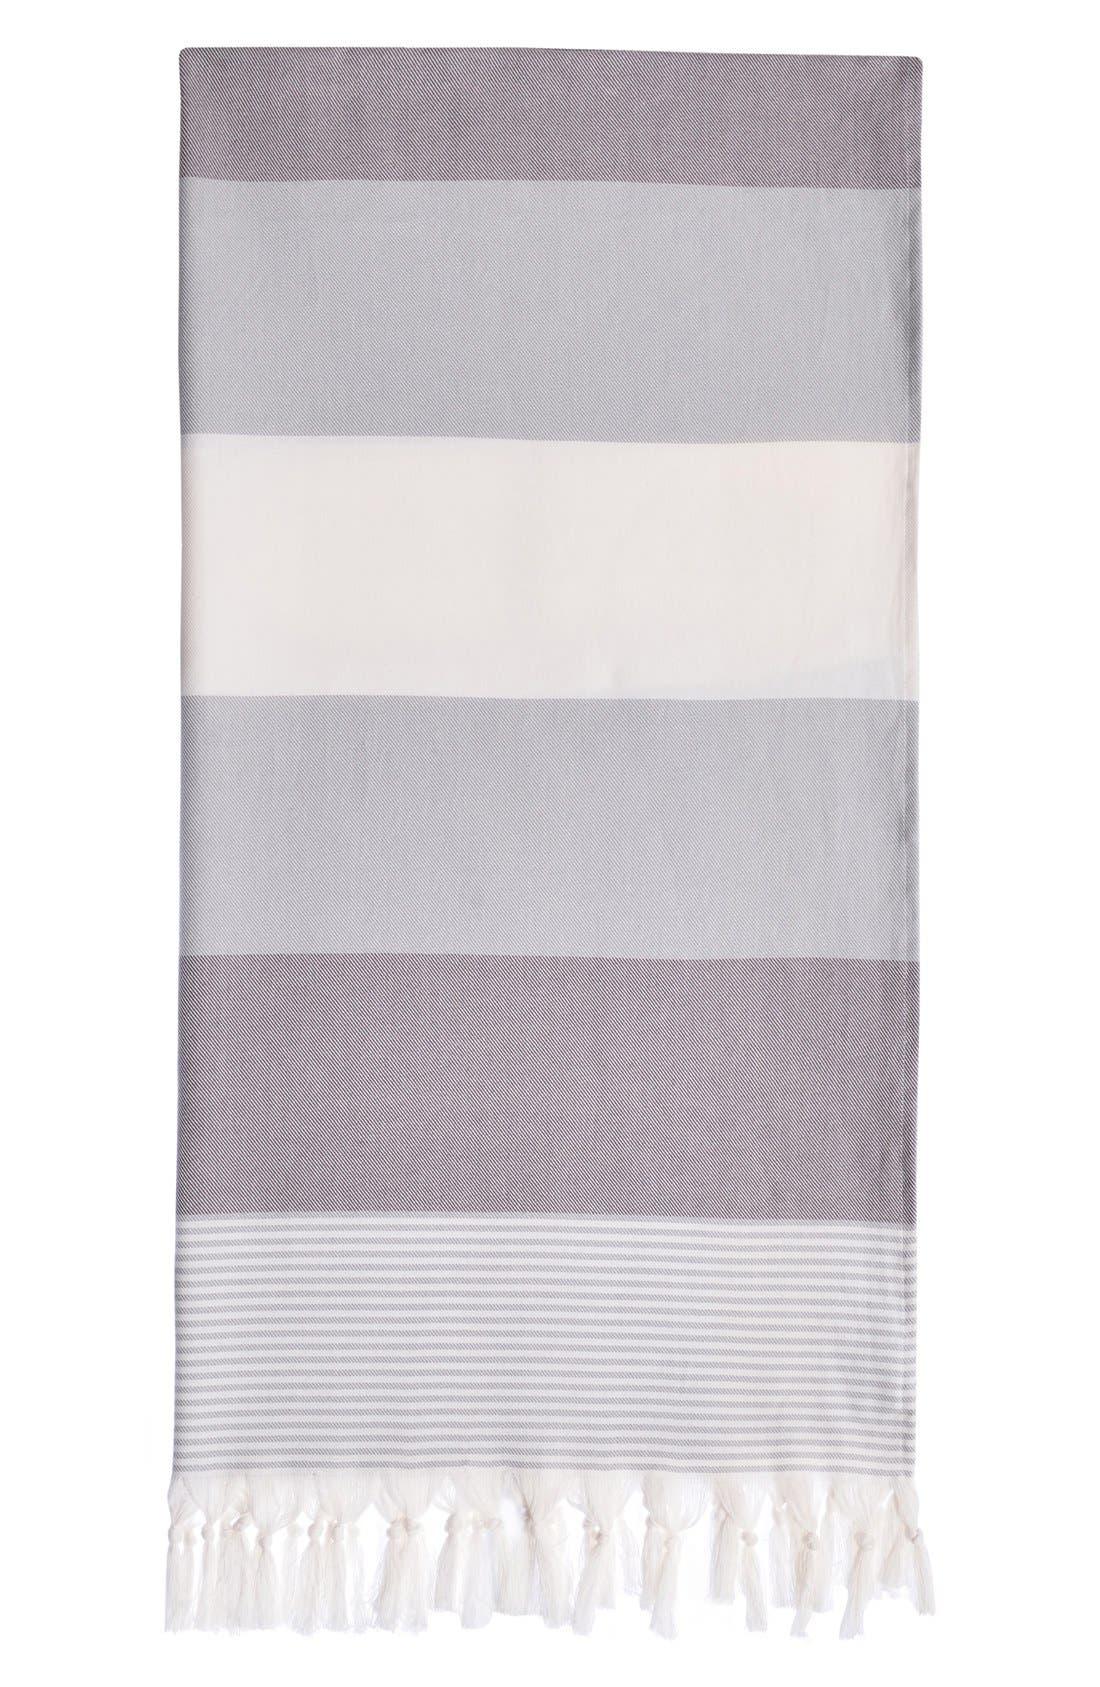 'Sea Waves' Turkish Pestemal Towel,                         Main,                         color, Grey